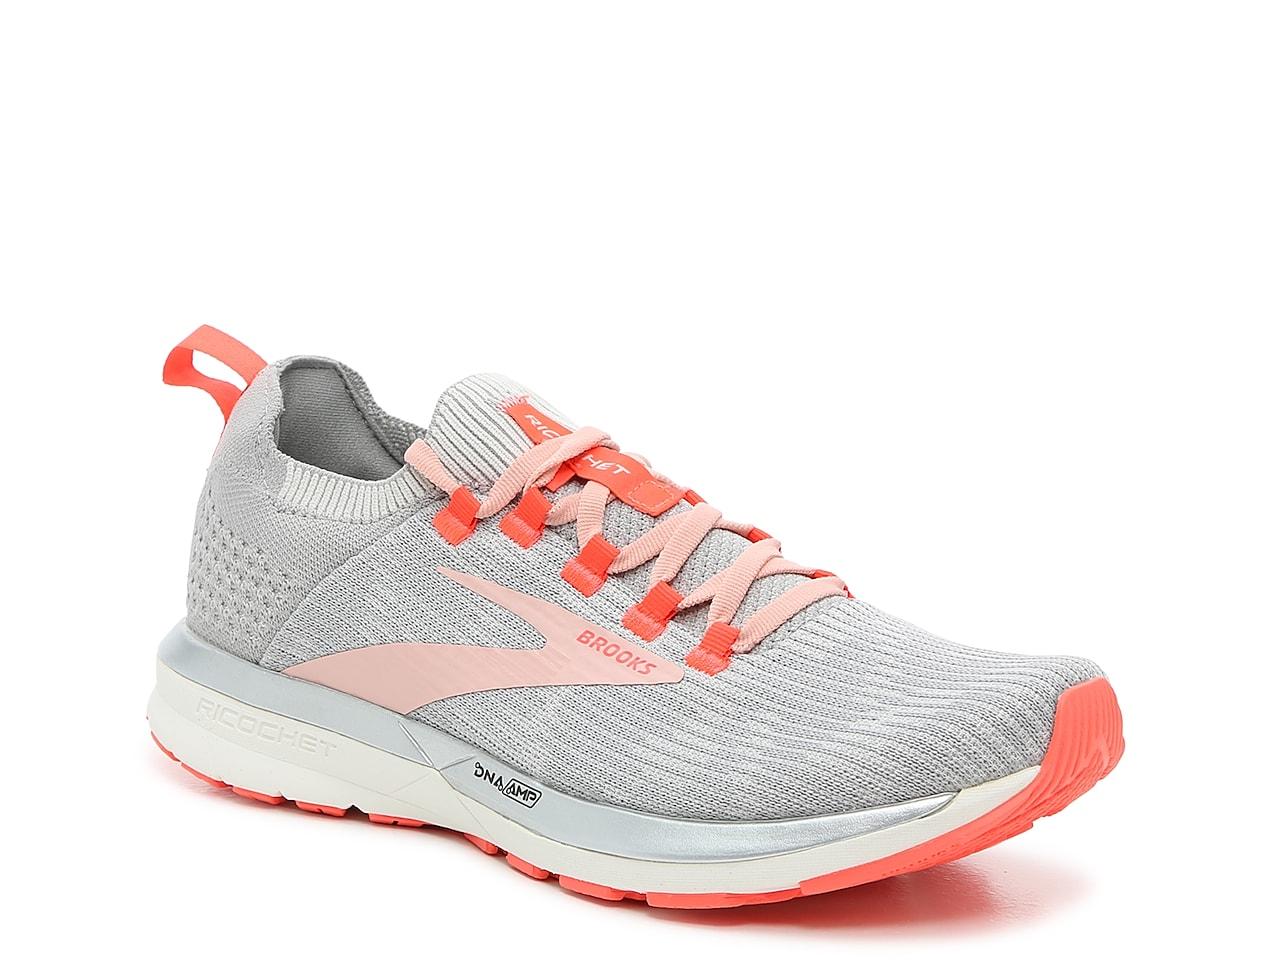 Ricochet 2 Running Shoe - Women's